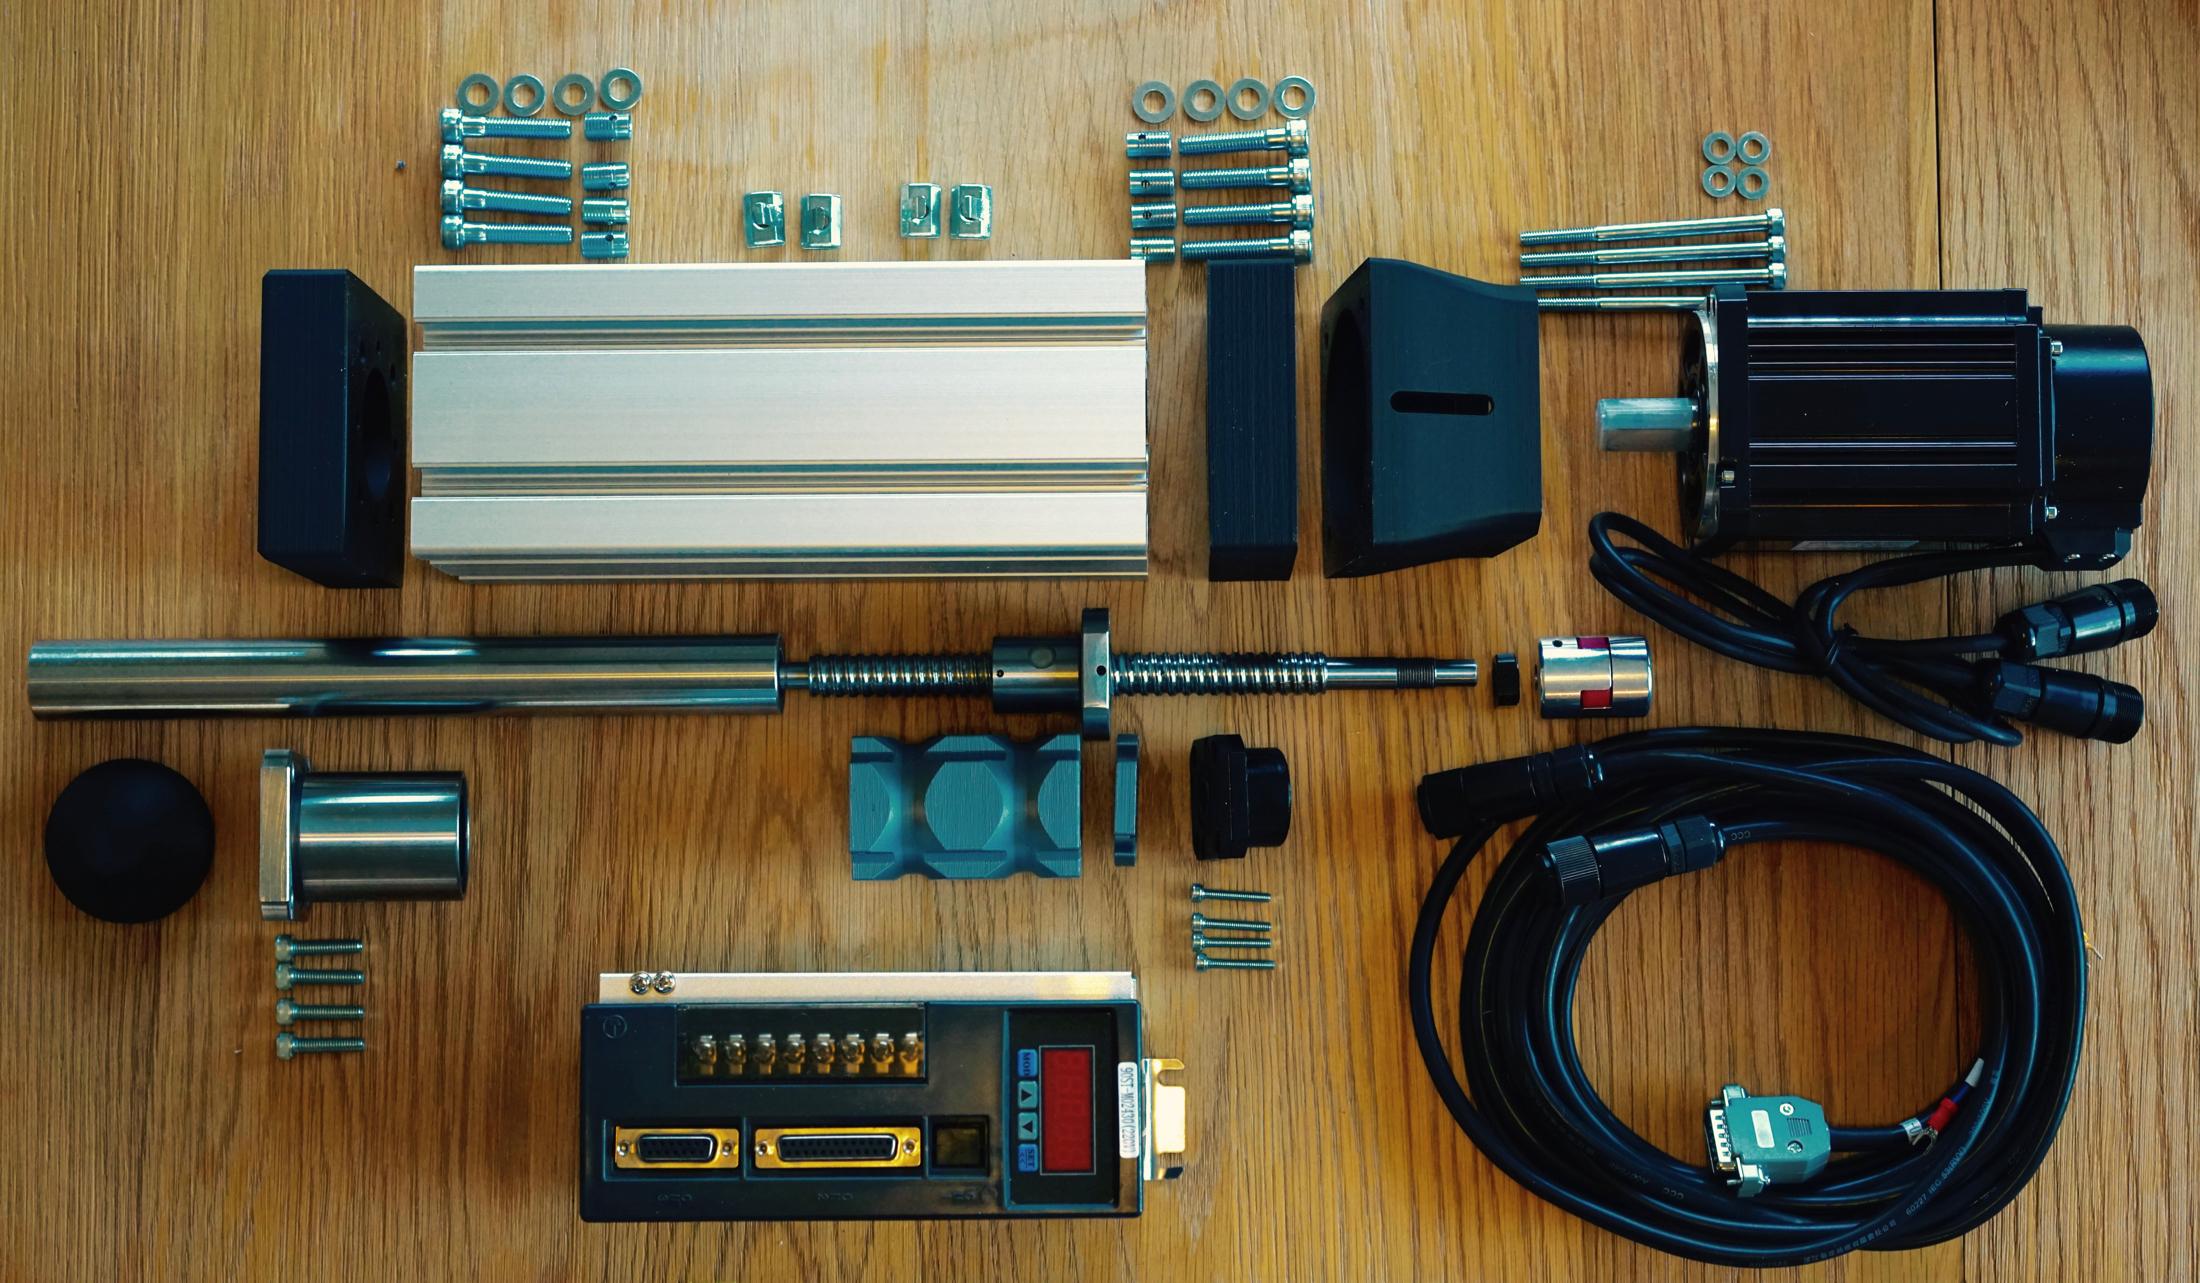 SFX-100 Actuator